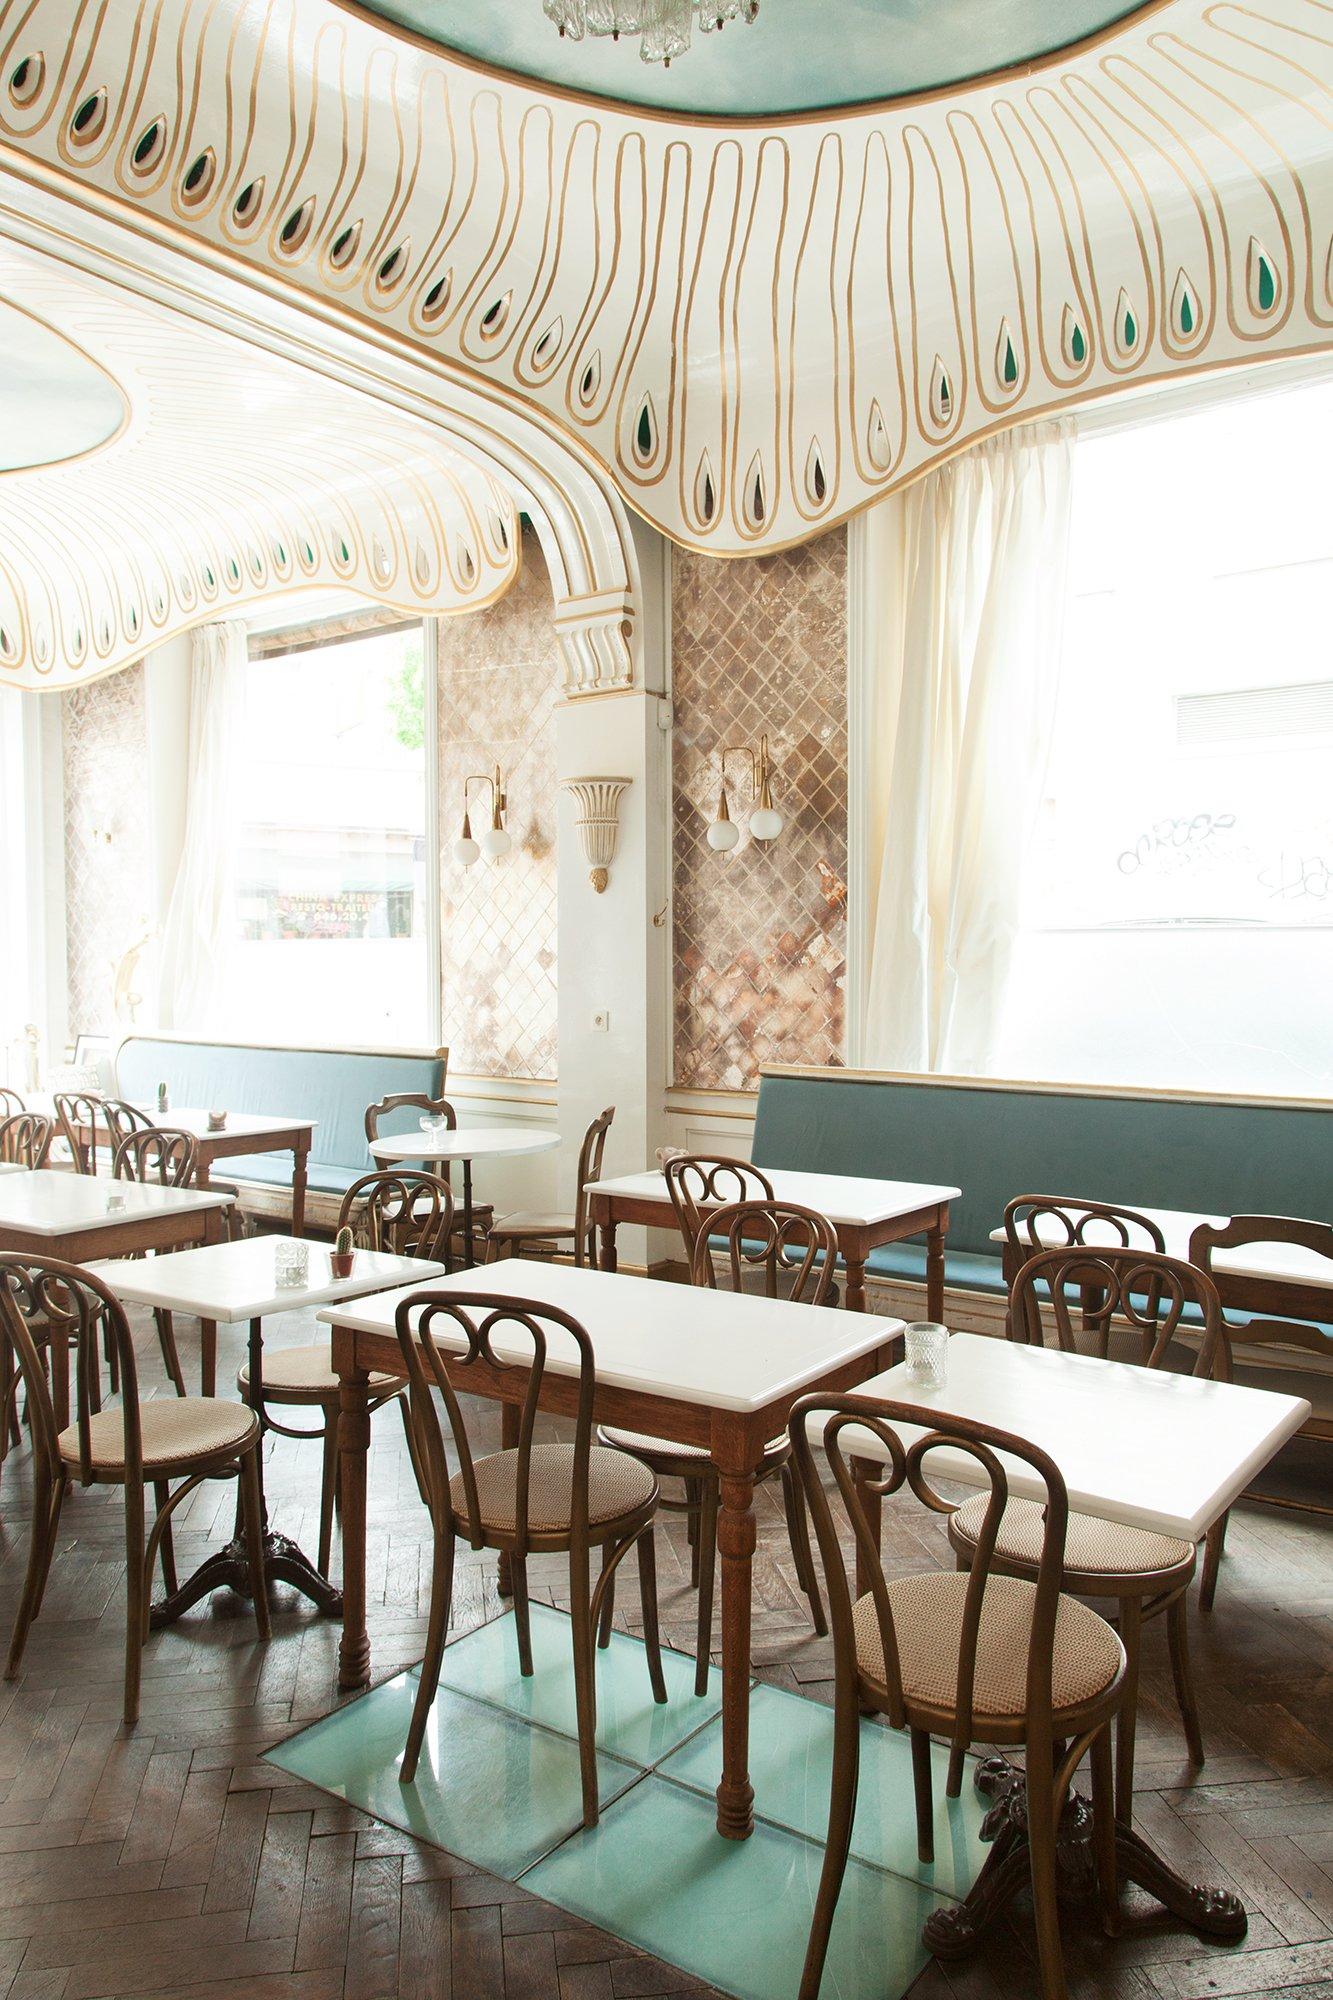 table et chaise restaurant table et chaise restaurant with table et chaise restaurant mobisco. Black Bedroom Furniture Sets. Home Design Ideas